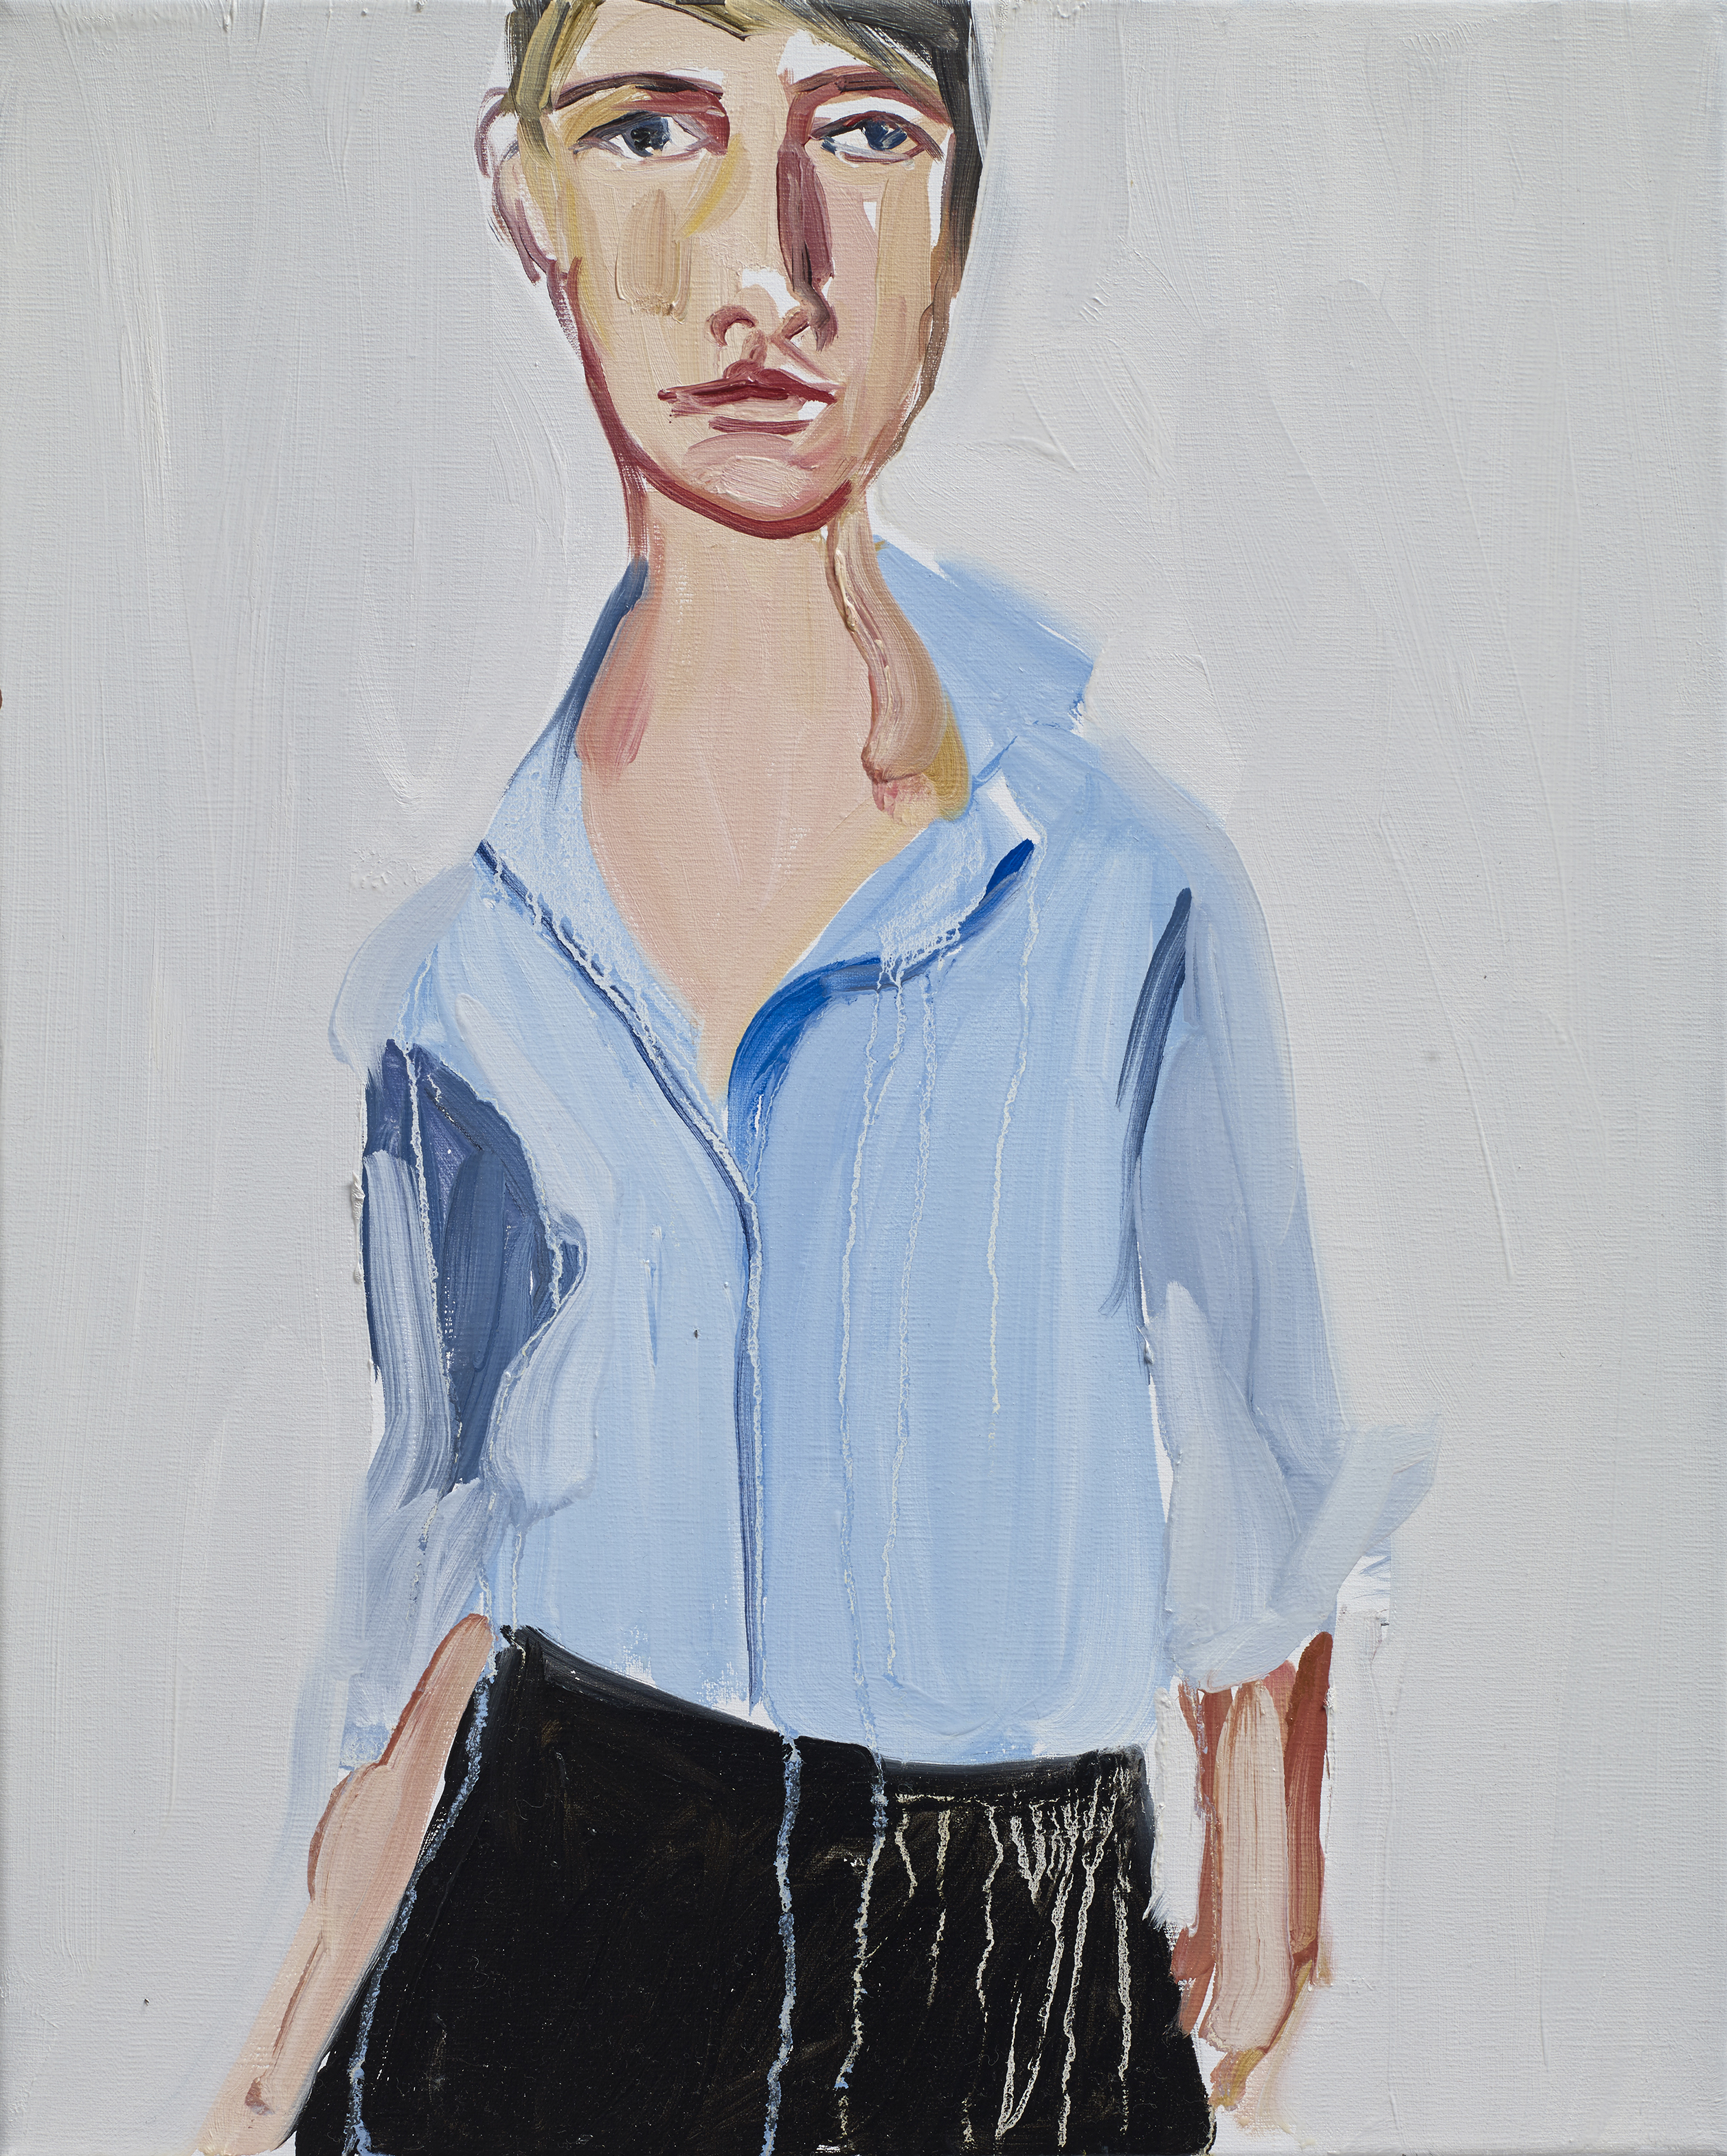 CJ1047_Brunette in a Blue Shirt_2015